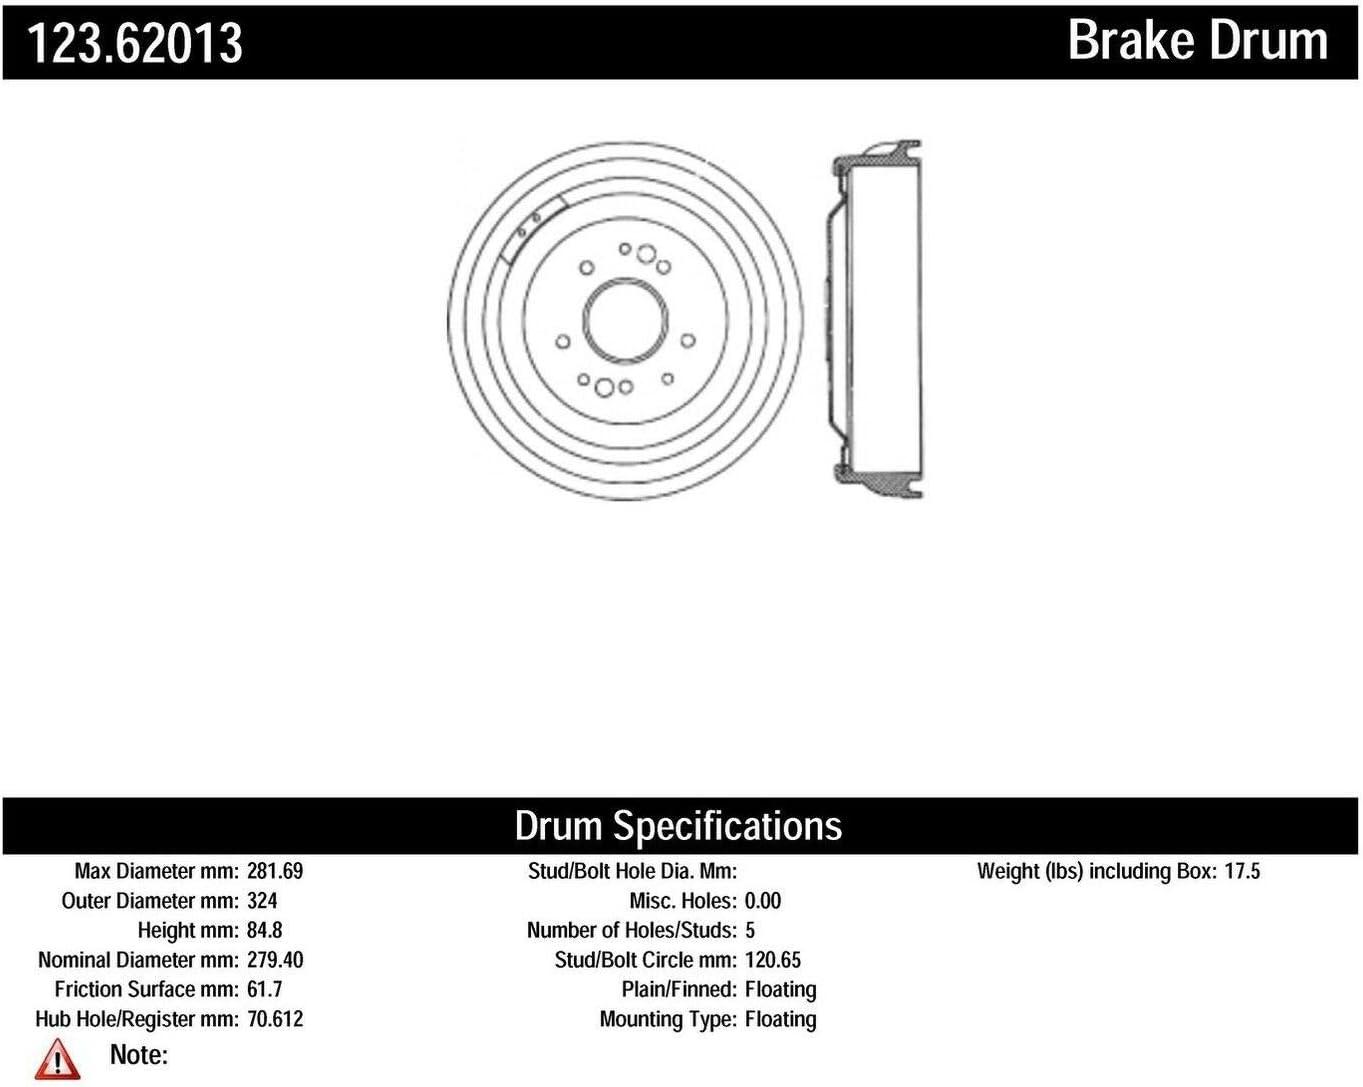 Centric Oakland Mall Parts 123.62013 Brake Drum Award-winning store